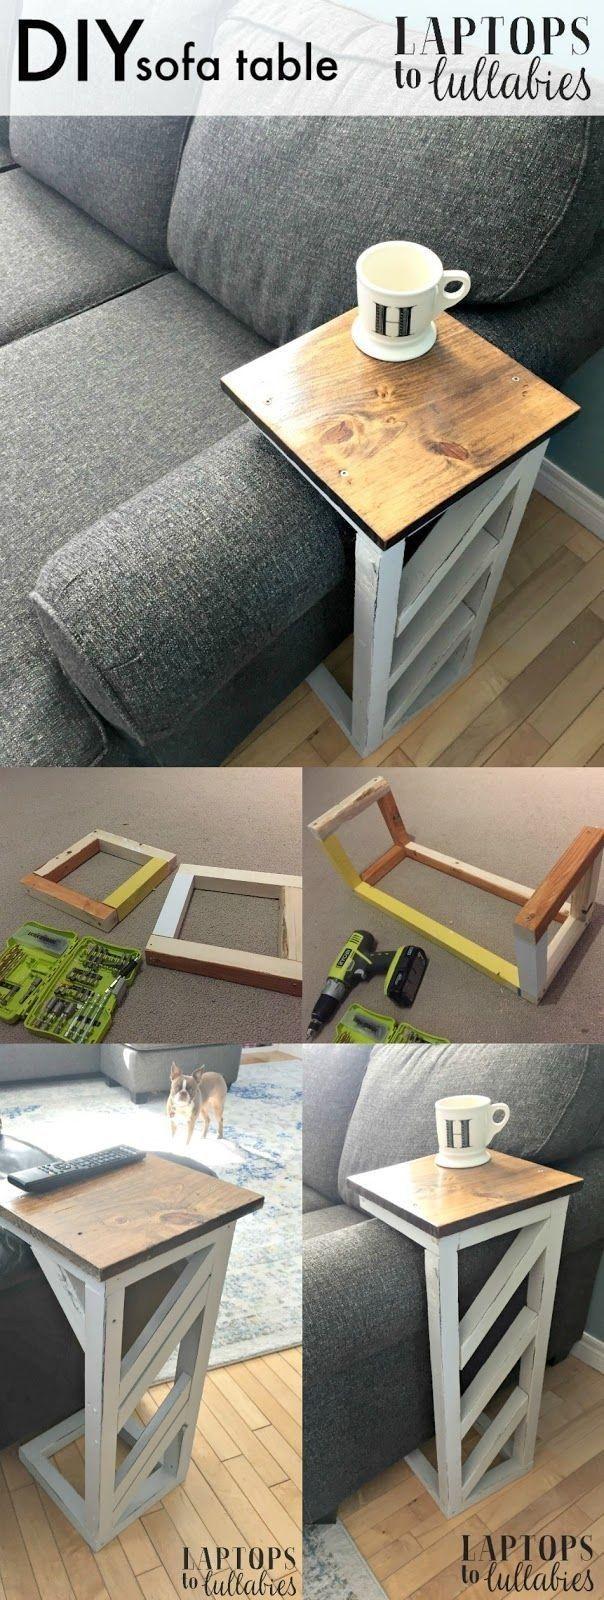 Diy sofa table, diy couch table, diy sofa arm table, diy couch arm table, easy to make, rustic, farmhouse, living room, basement, home decor, diy decor, diy home decor, easy to make or buy one simil (Step Design Wood)